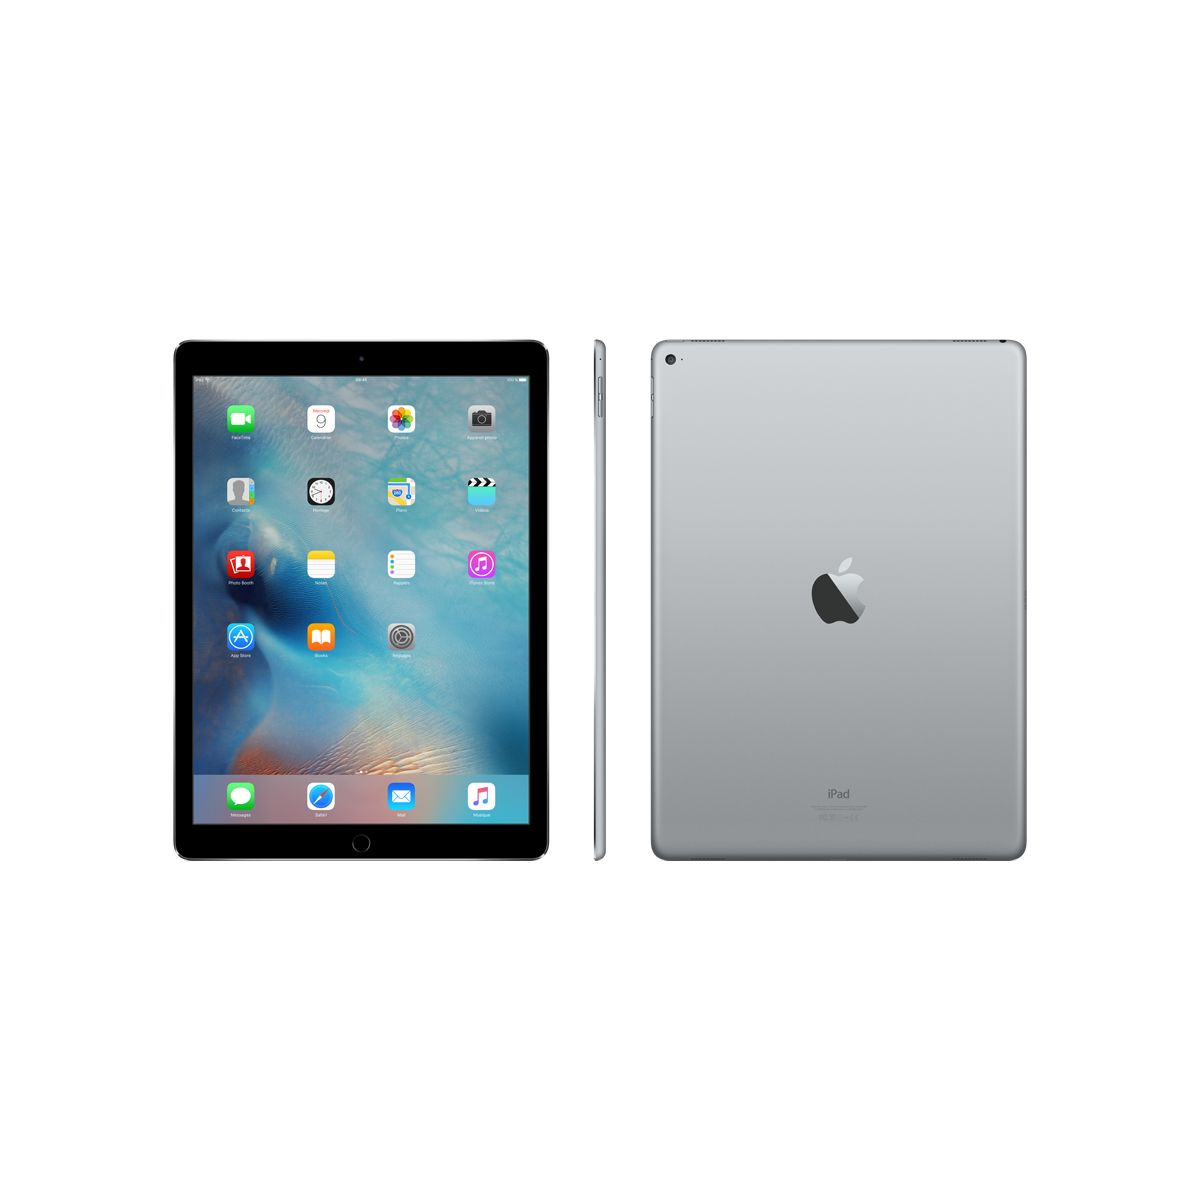 APPLE iPad Pro 12.9 32Go Gris sidéral